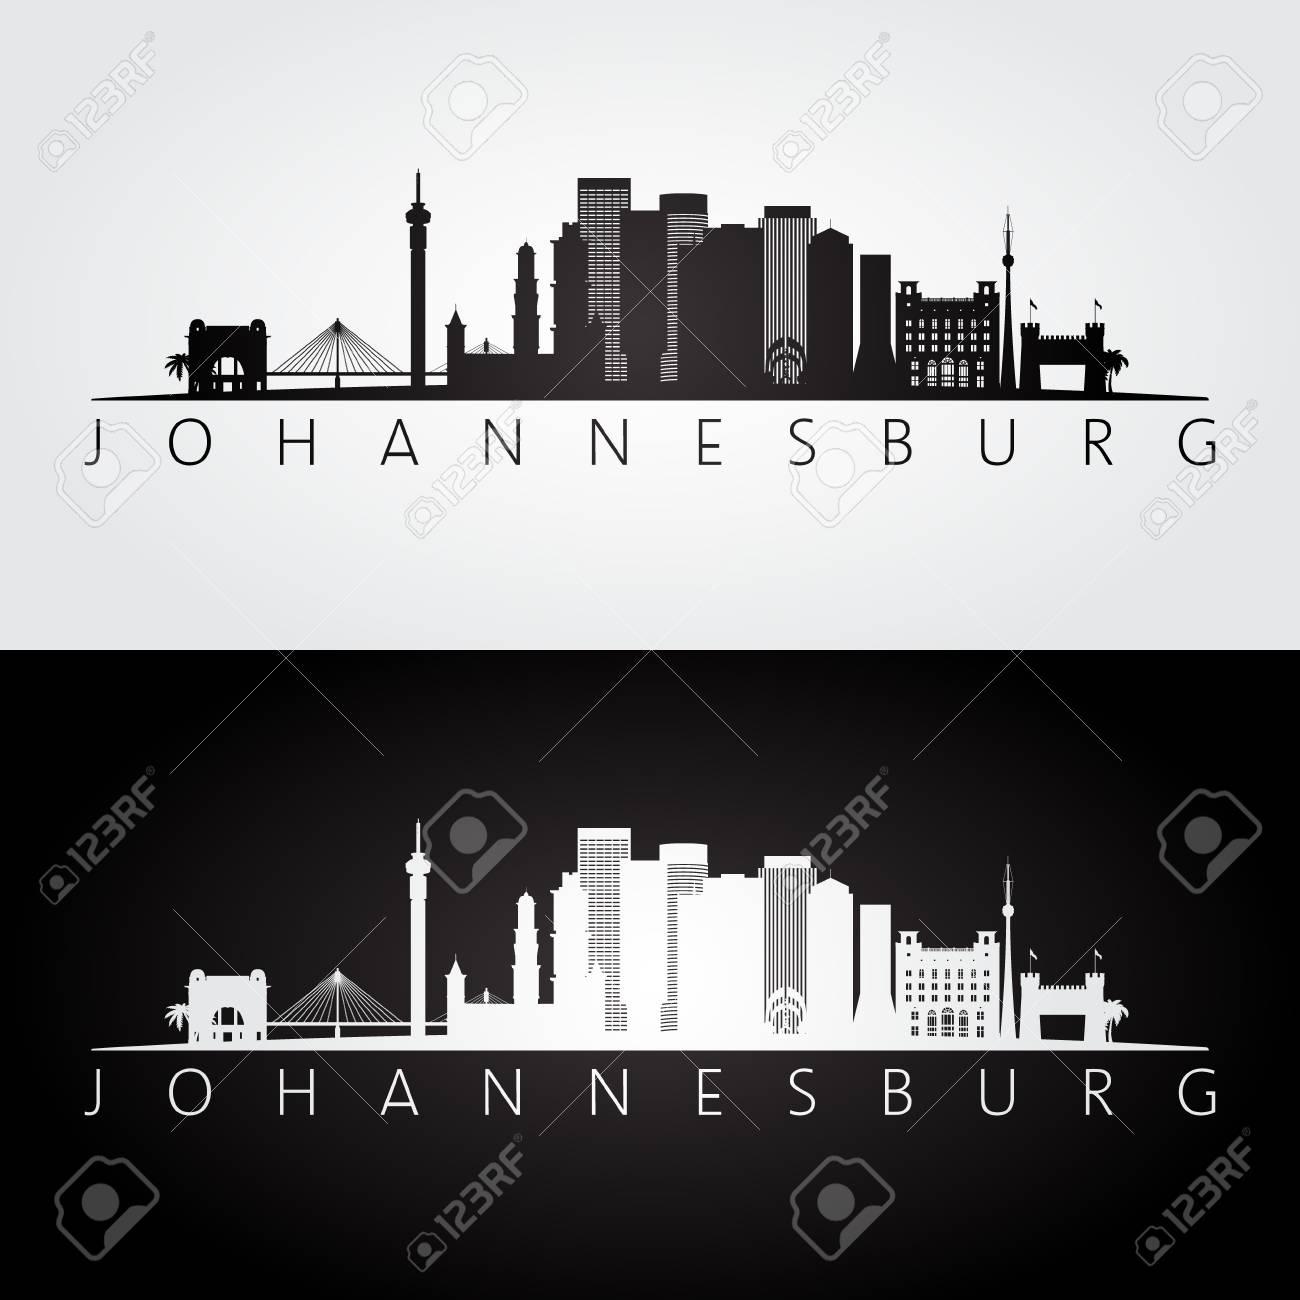 Johannesburg skyline and landmarks silhouette black and white johannesburg skyline and landmarks silhouette black and white design vector illustration stock vector thecheapjerseys Images